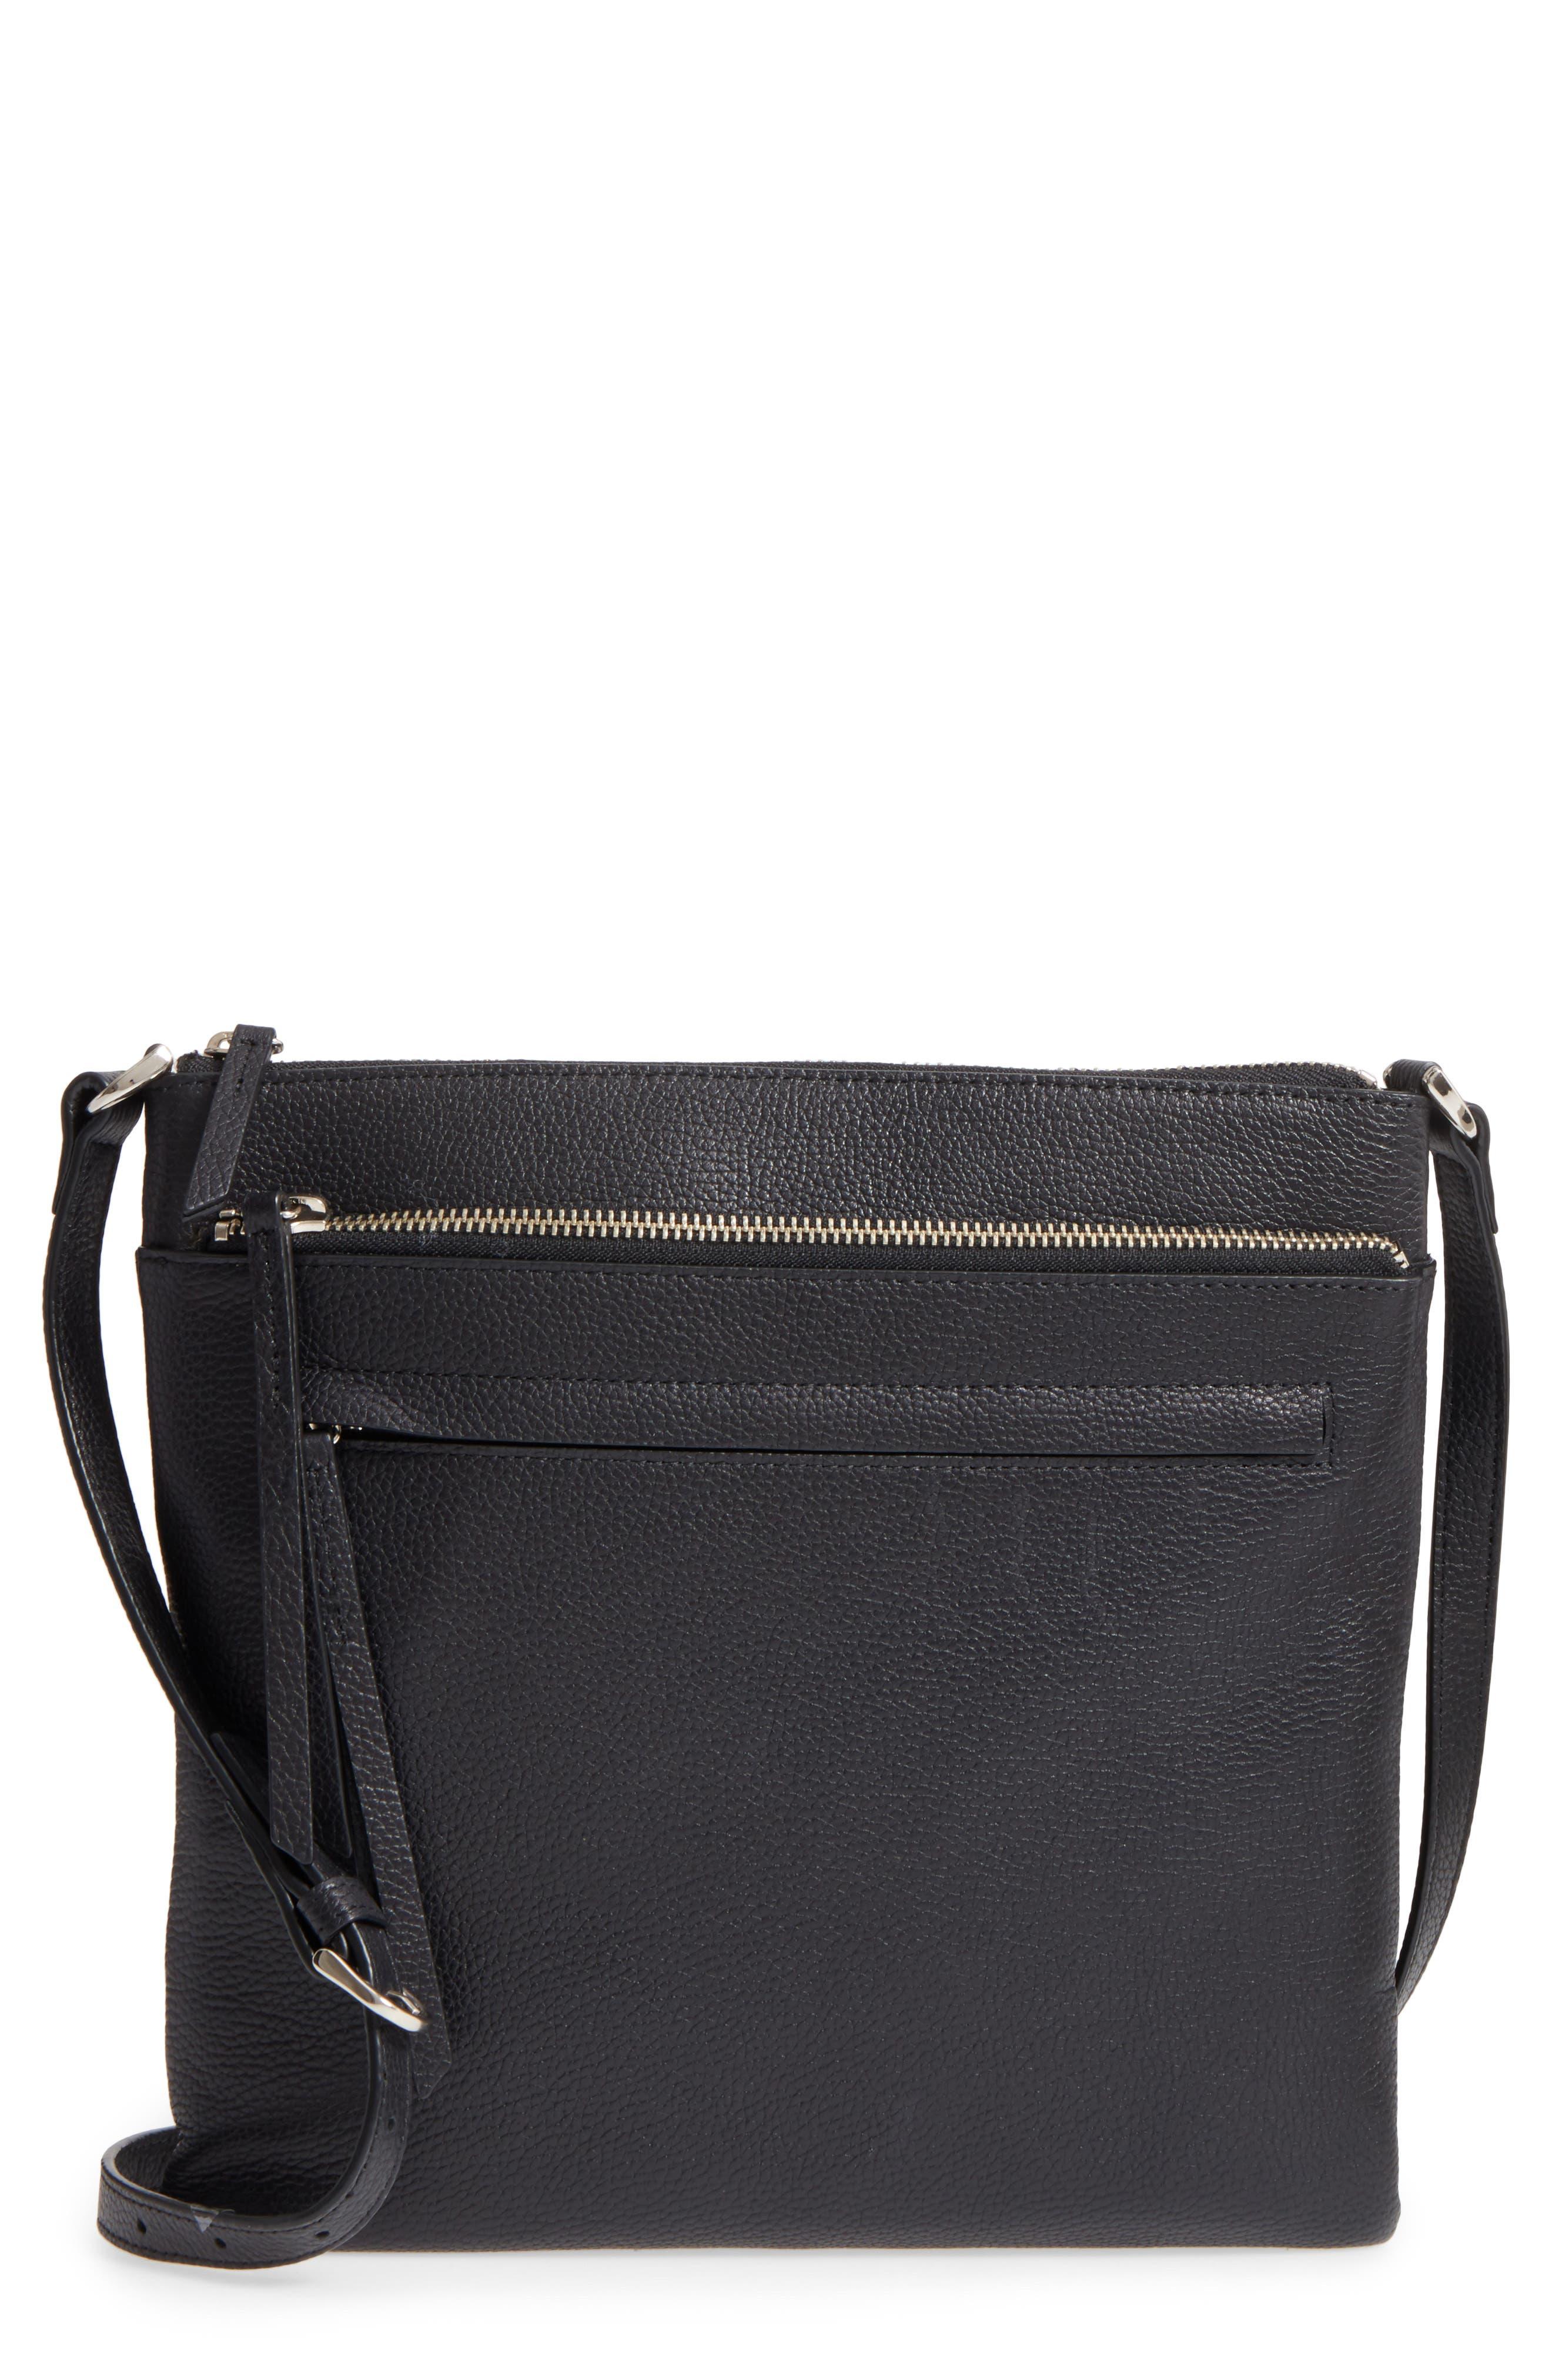 NORDSTROM, Finn Leather Crossbody Bag, Main thumbnail 1, color, BLACK